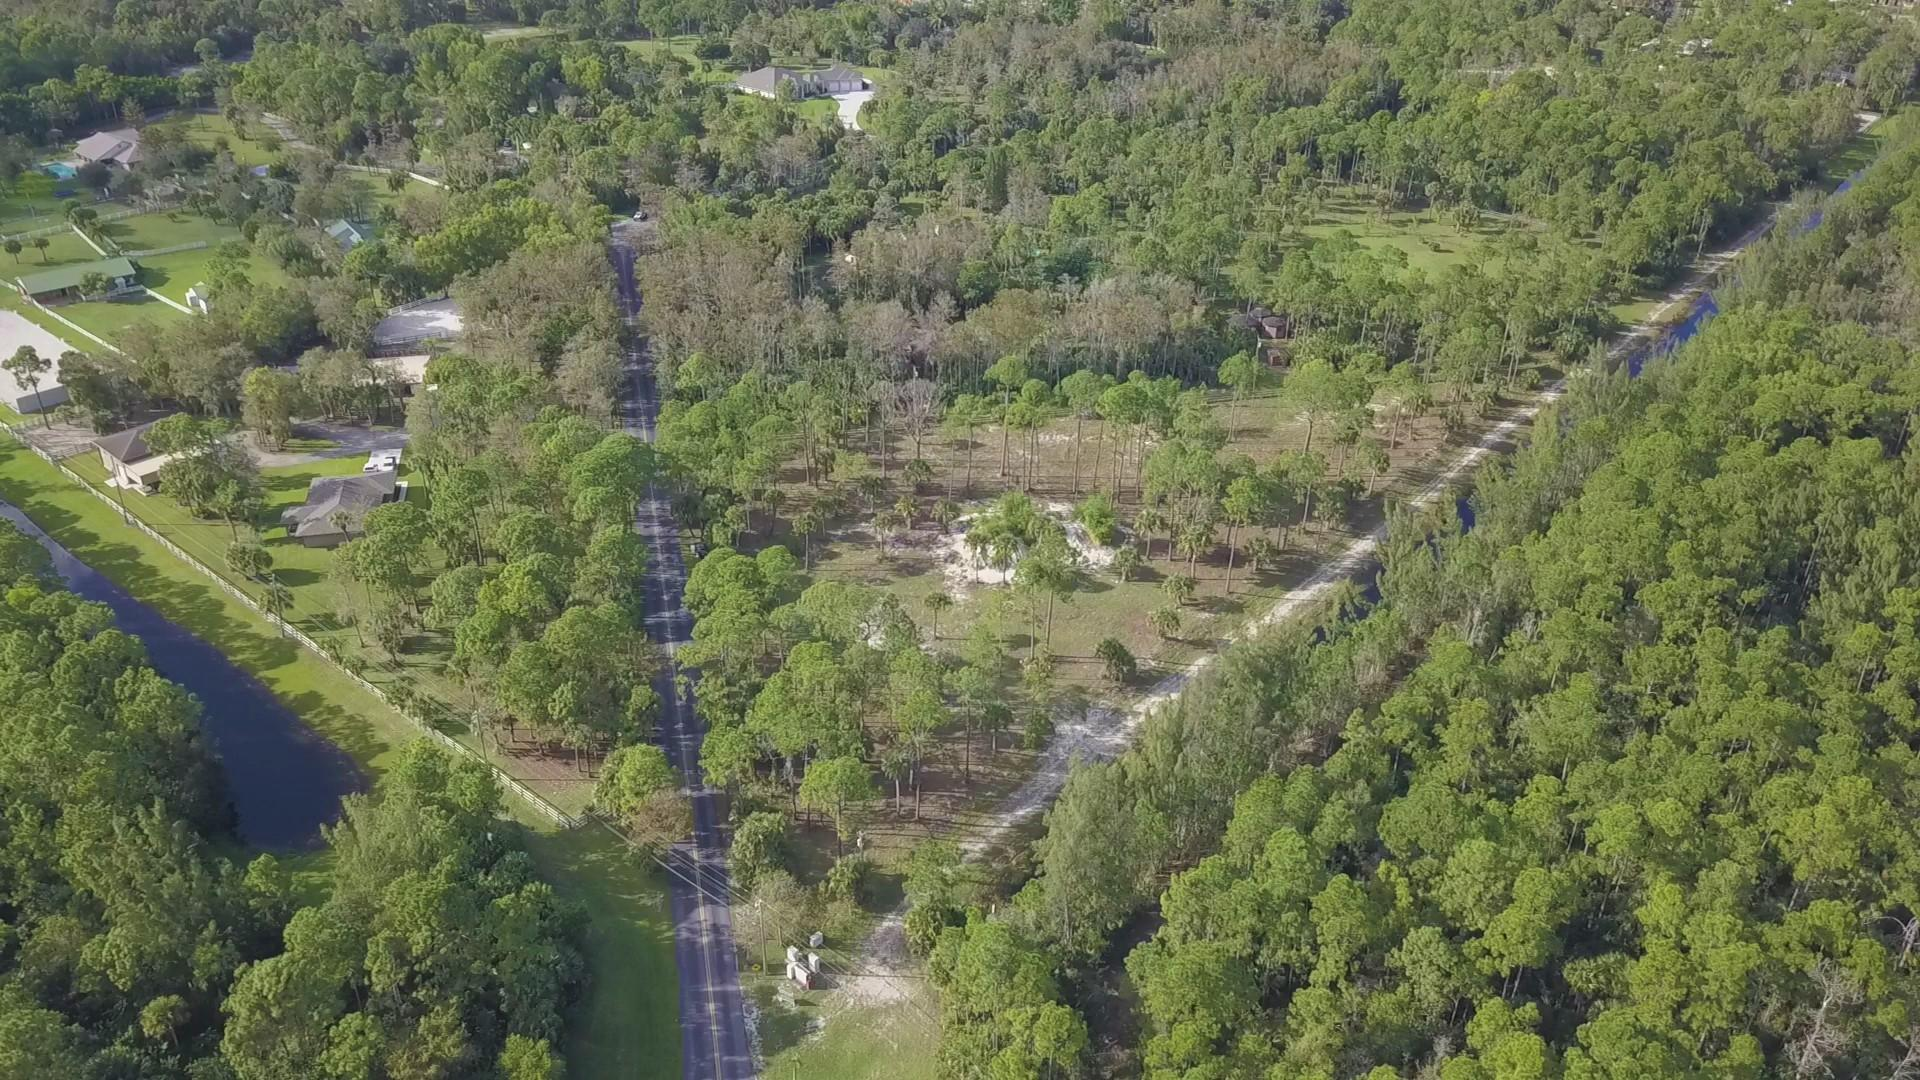 2070 Deer Run Boulevard, Loxahatchee in Palm Beach County, FL 33470 Home for Sale